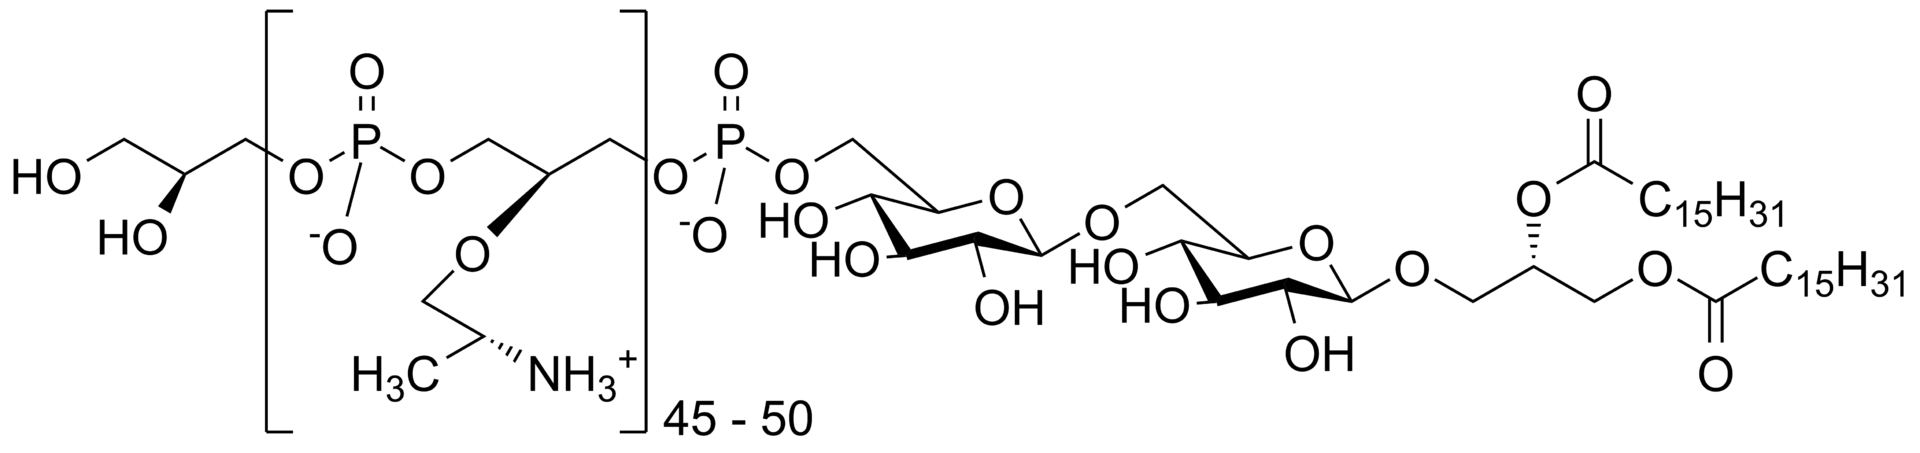 Key Difference - Wall Teichoic Acid vs Lipoteichoic Acid